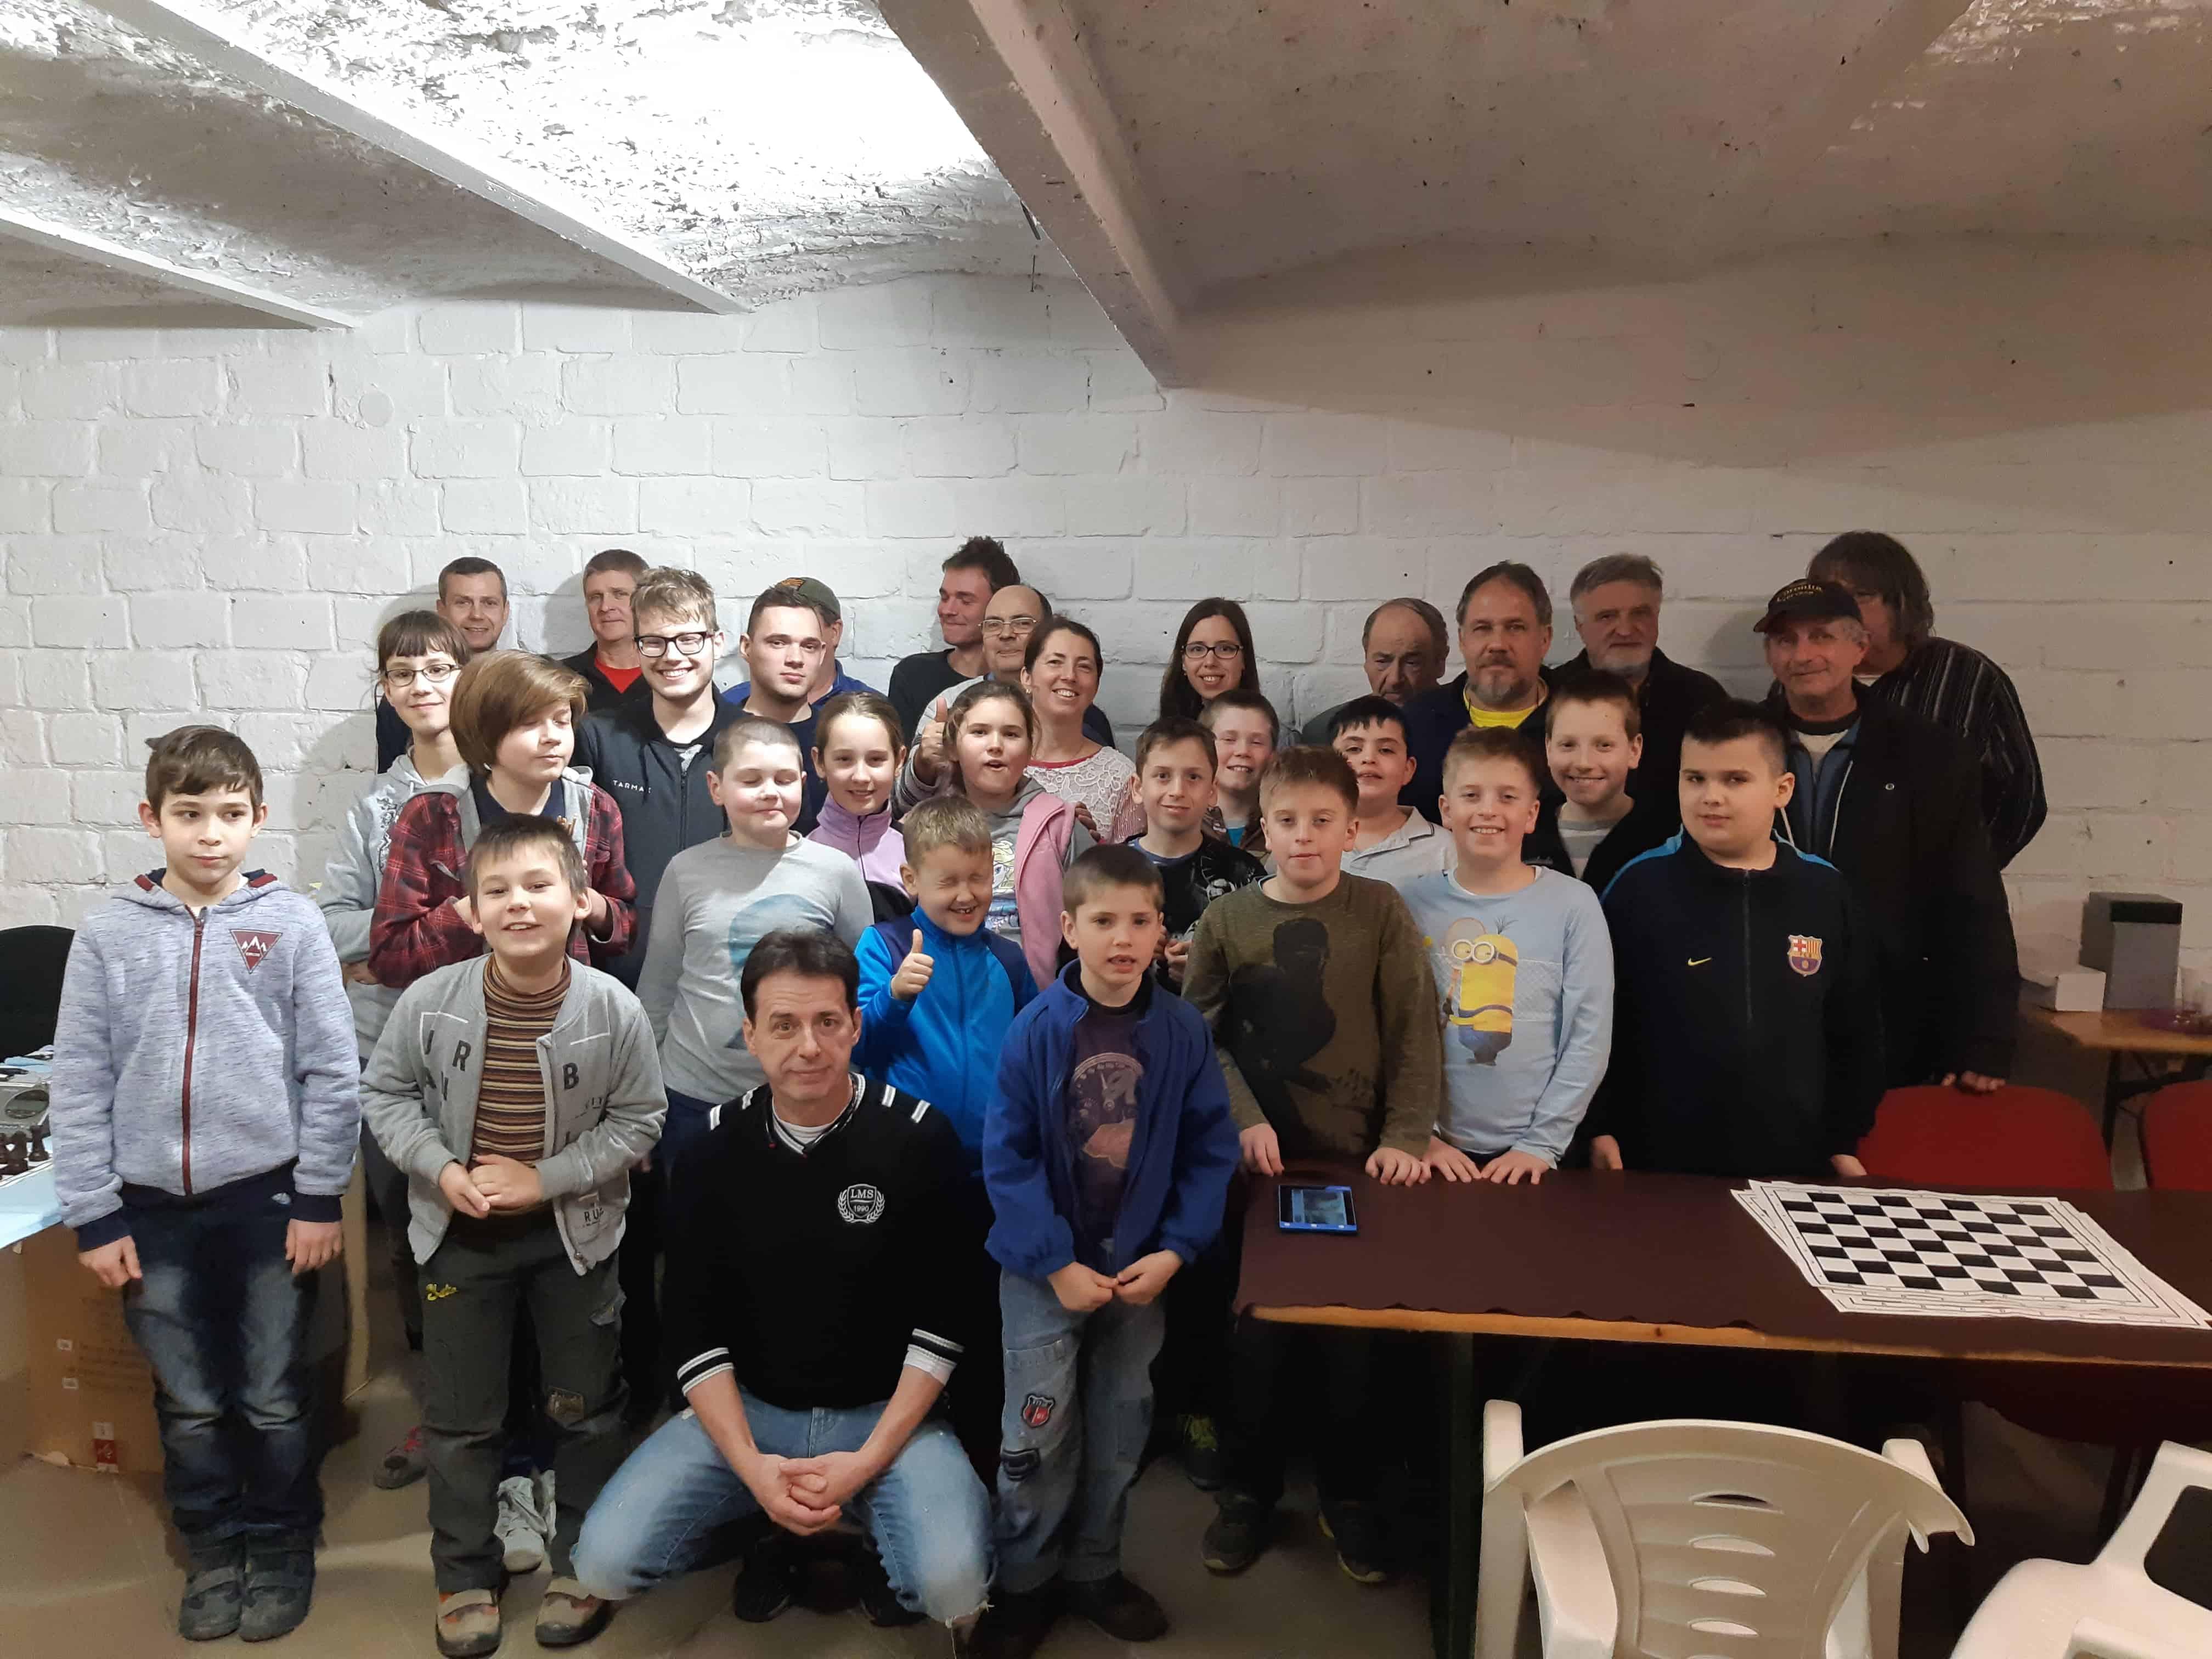 2019.02.23. SakkSarok Schnell sakkversenyről